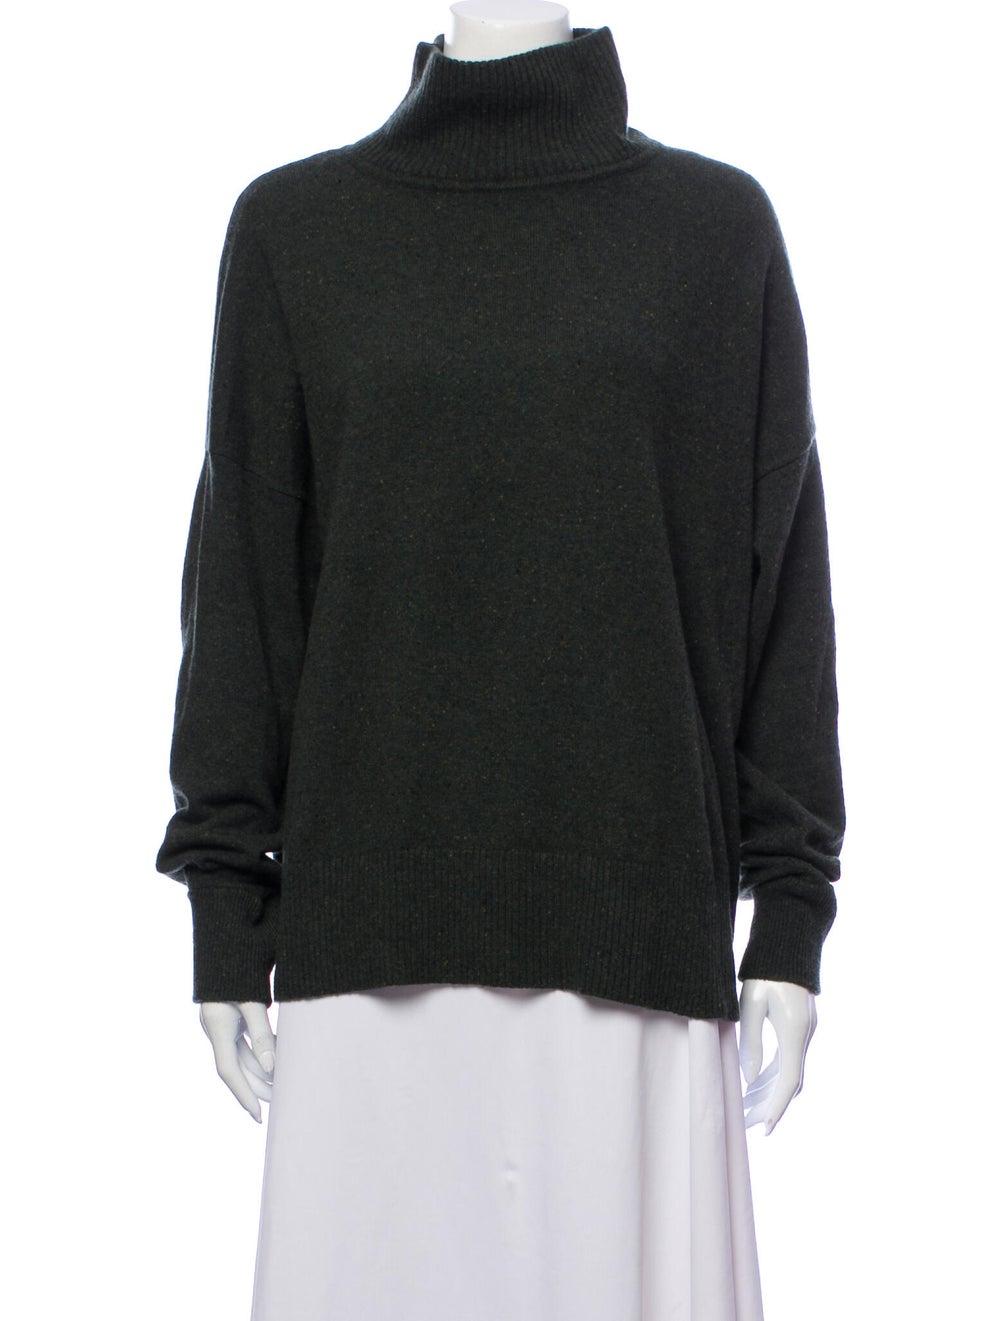 Autumn Cashmere Cashmere Turtleneck Sweater Green - image 1